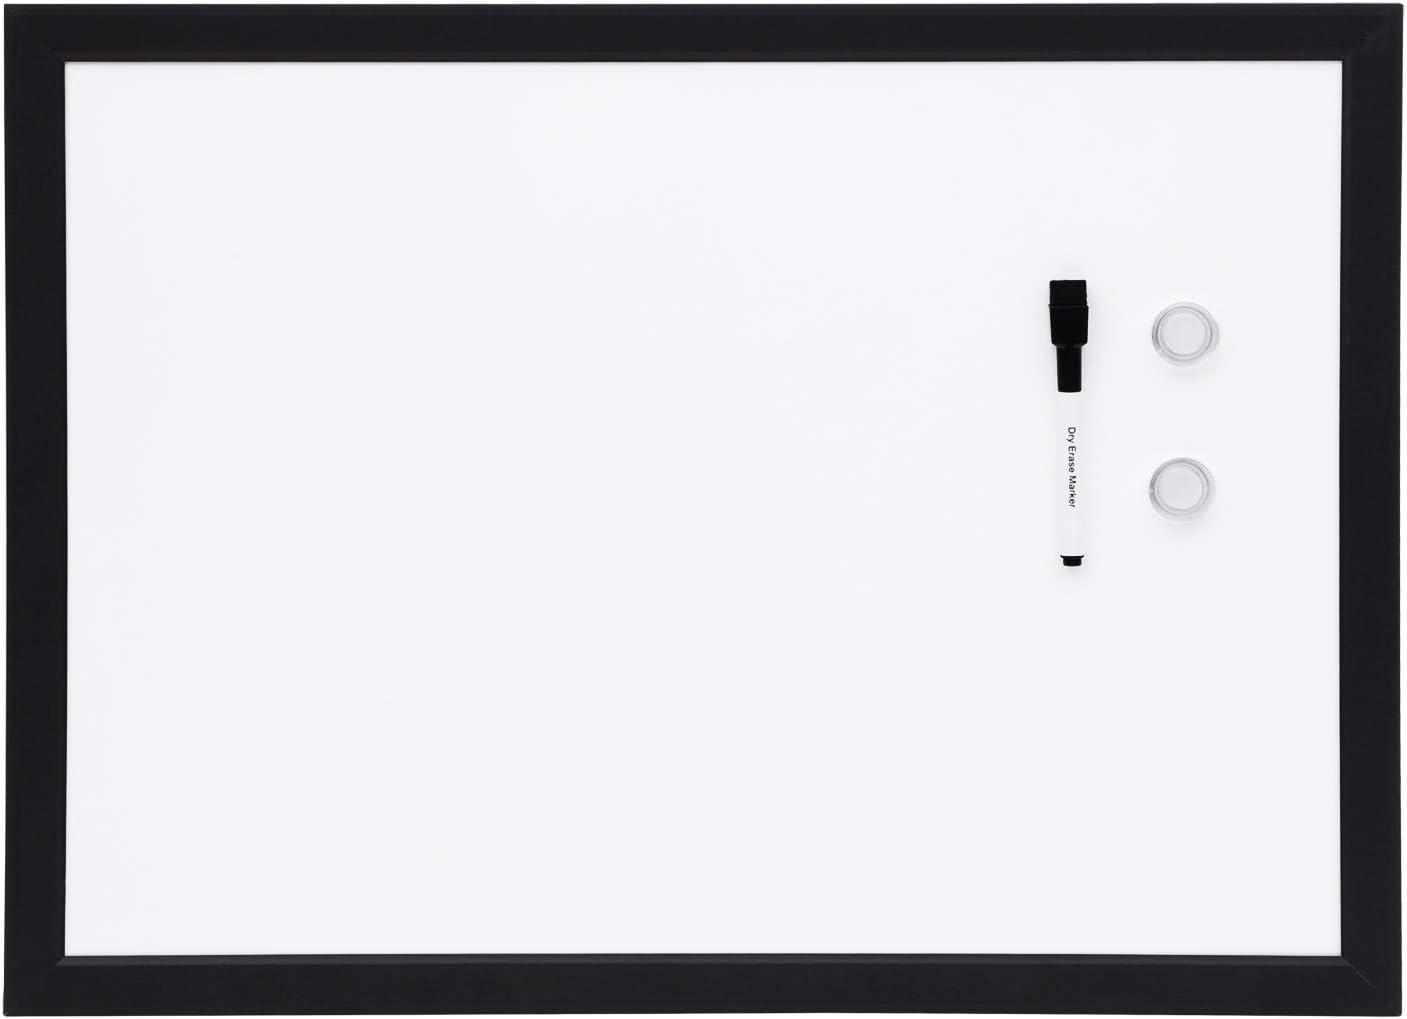 AmazonBasics Magnetic Framed Dry Erase White Board, 17 x 23 Inch